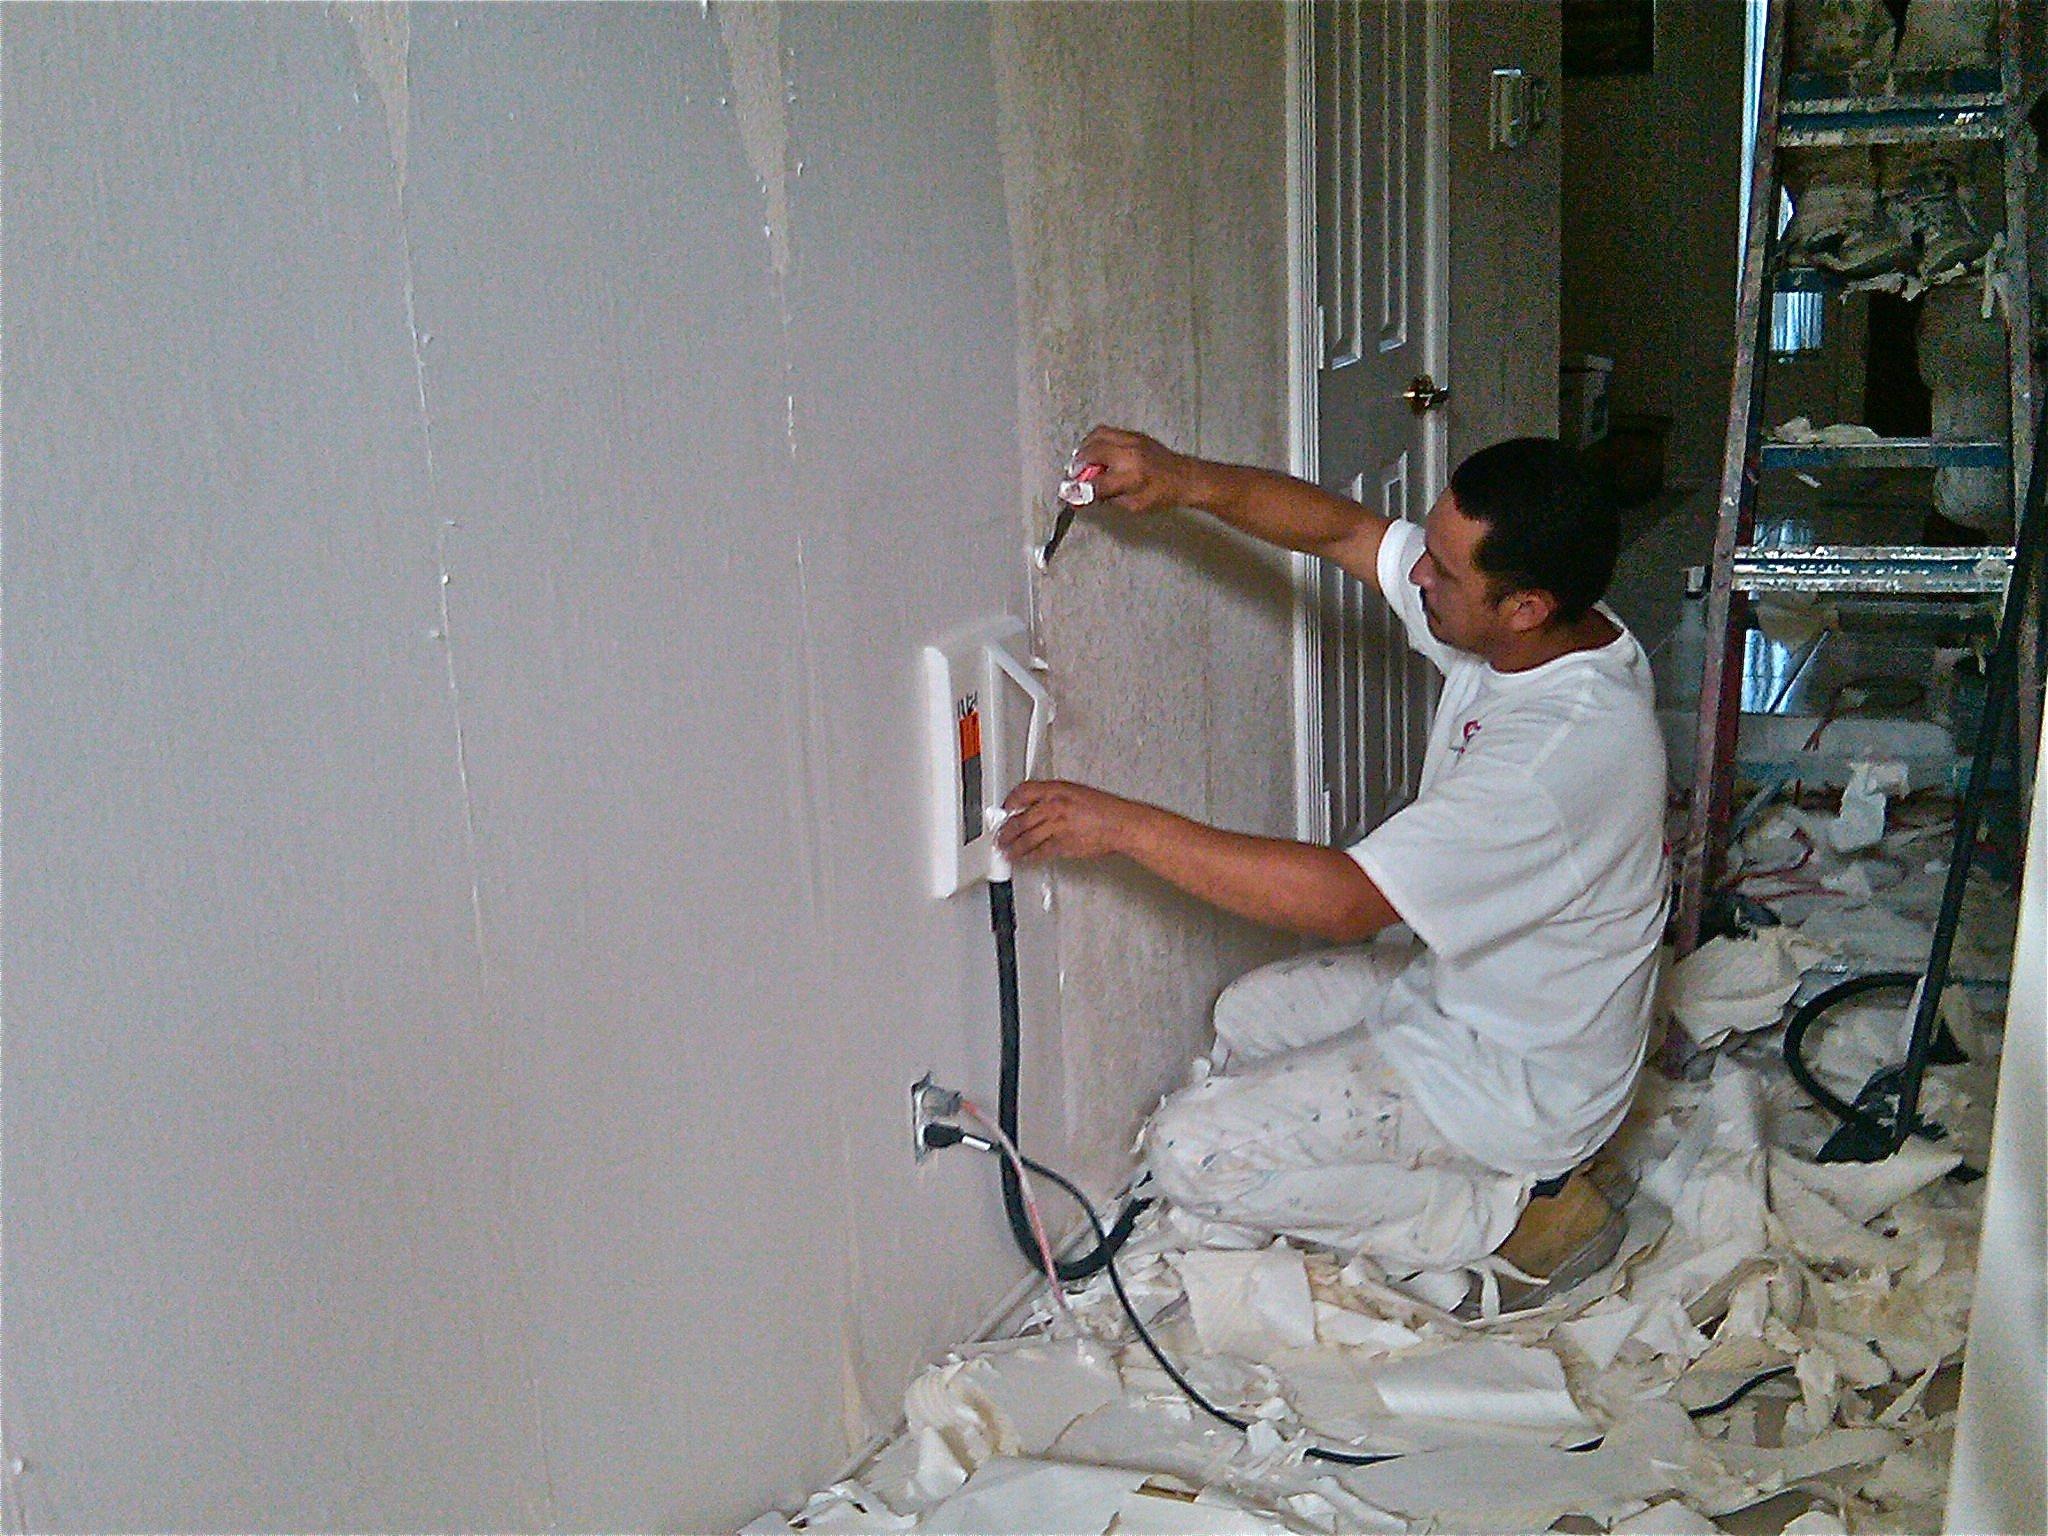 Steamer Wallpaper Remover 2048x1536